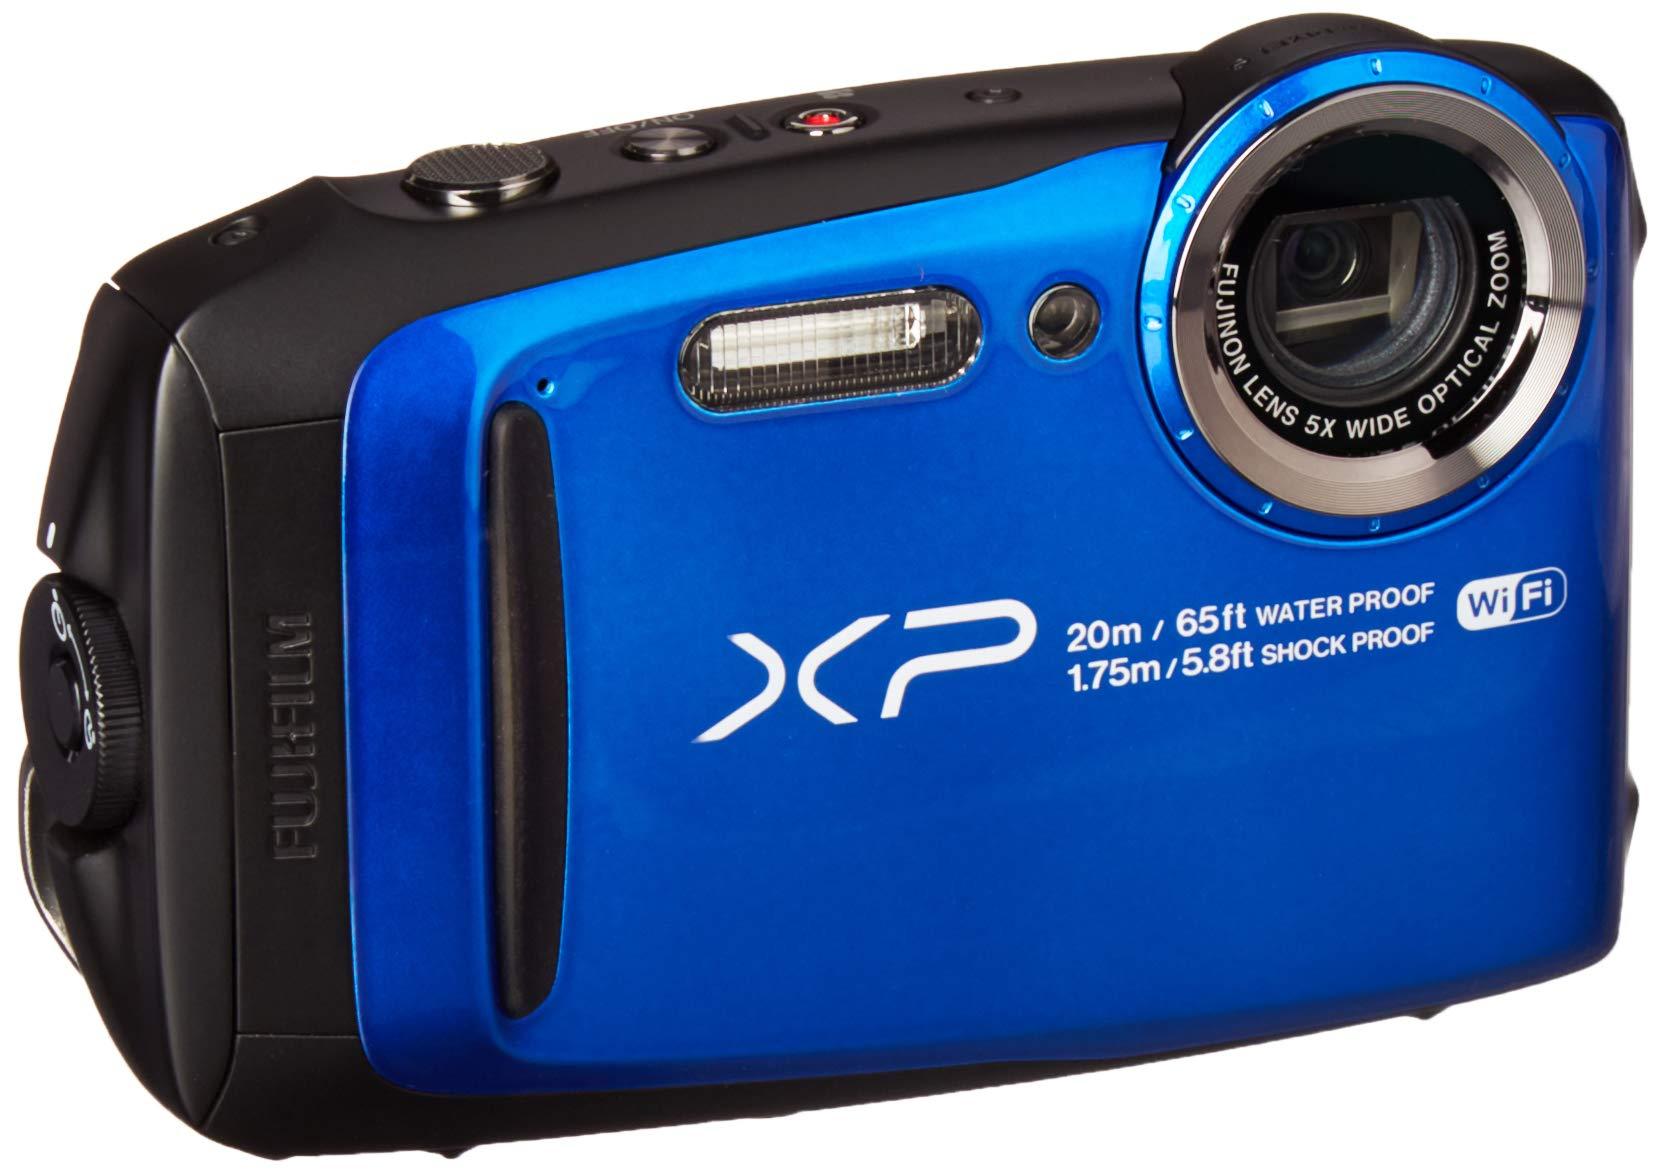 Fujifilm FinePix XP120 Waterproof Digital Underwater Camera USA Model (Blue)